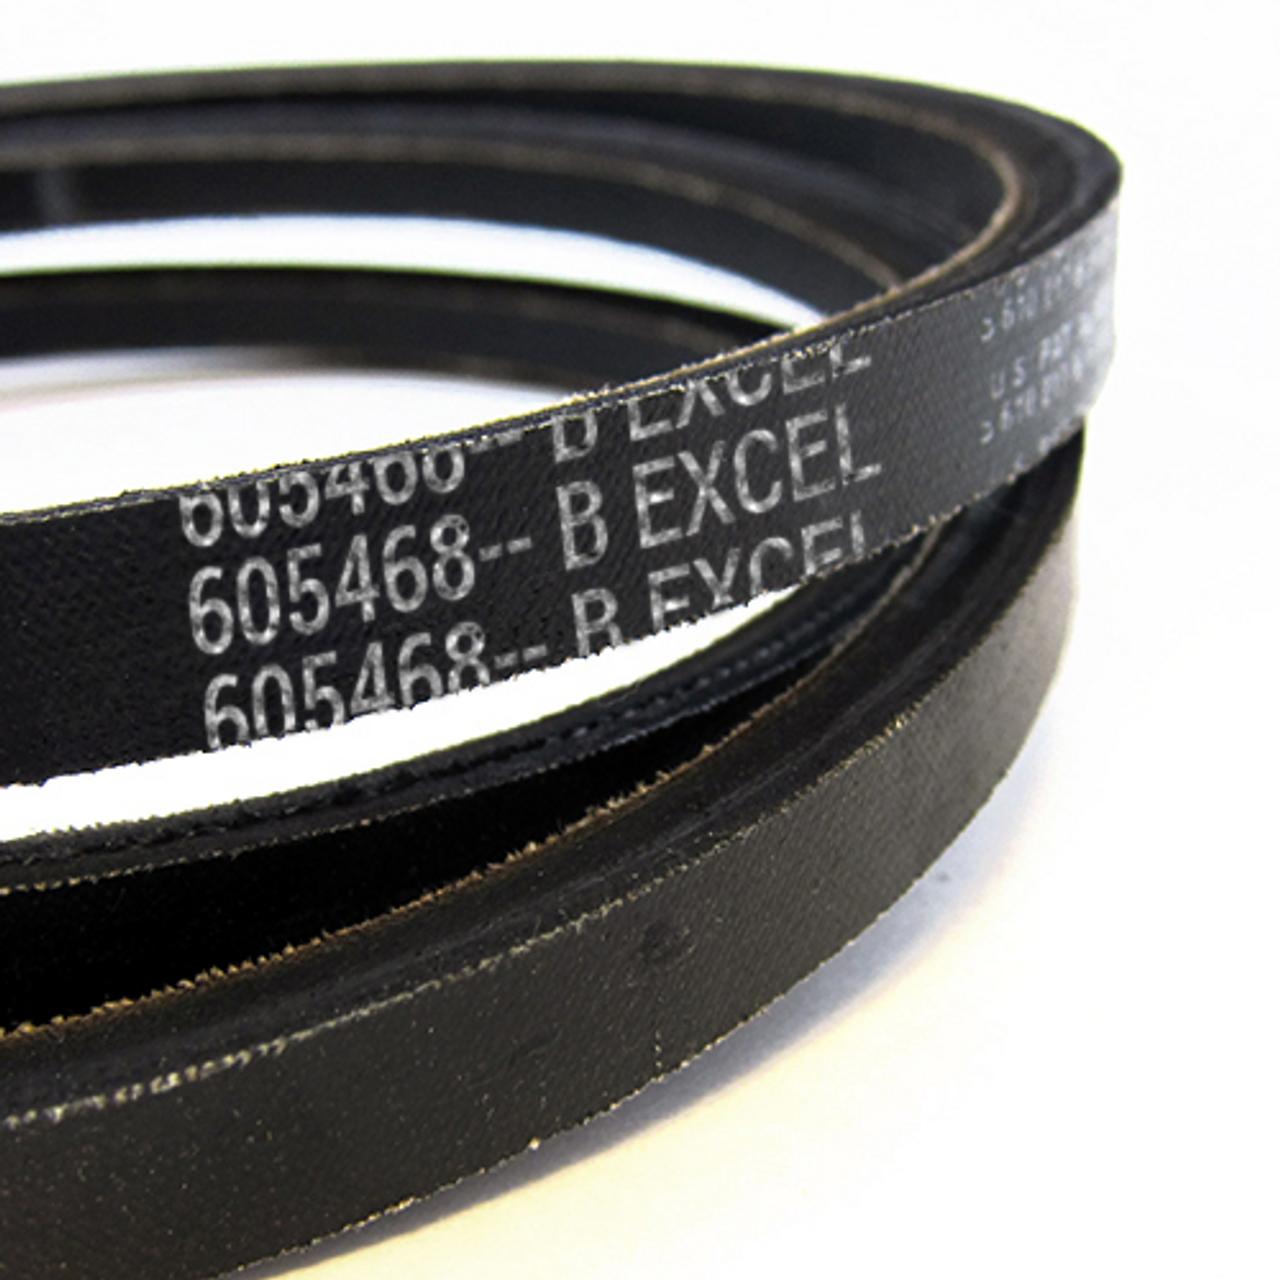 HUSTLER OEM Replacement Belt Replace 605468 1//2X67.25